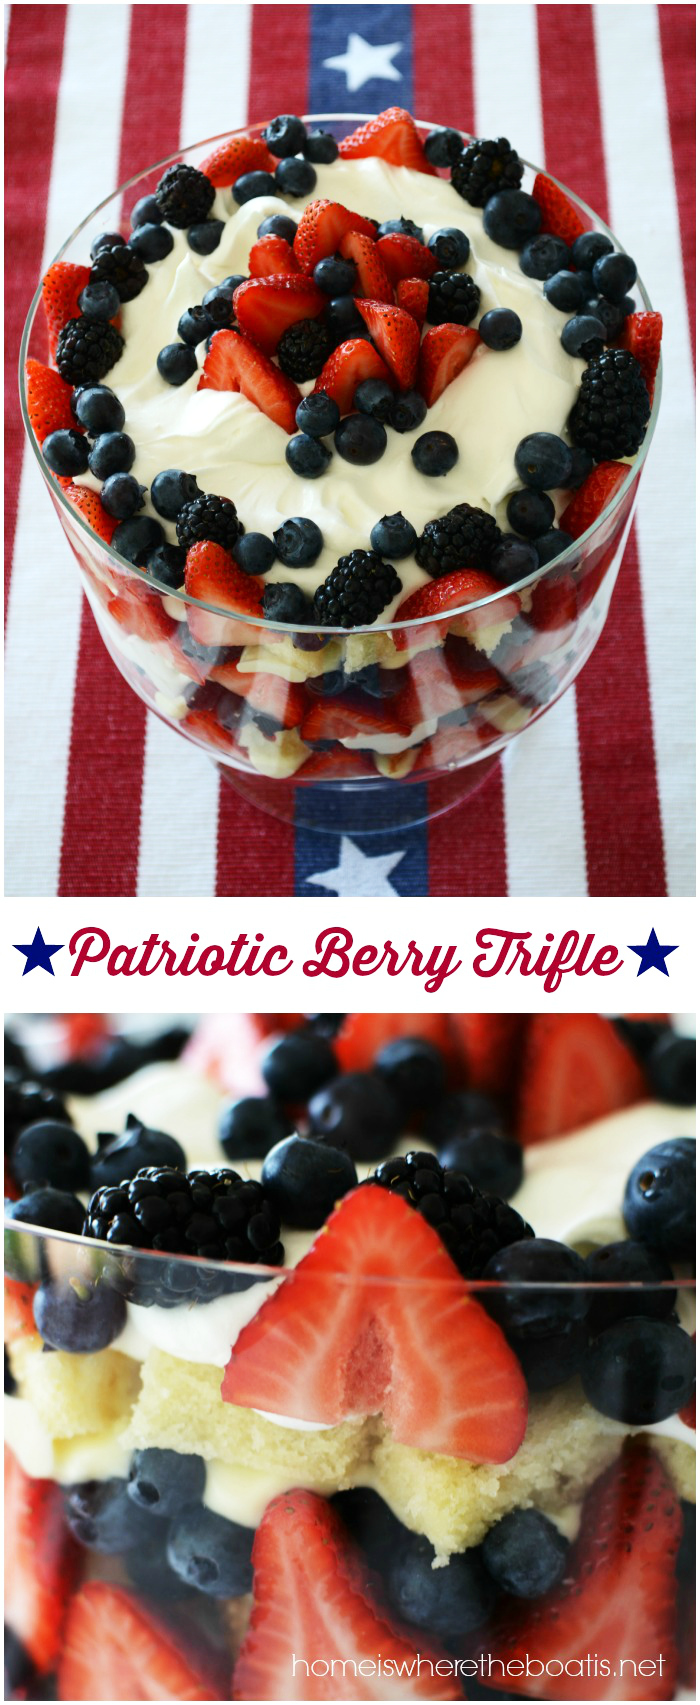 Patriotic Berry Trifle | ©homeiswheretheboatis.net #patriotic #desserts #easy #nobake #july4th